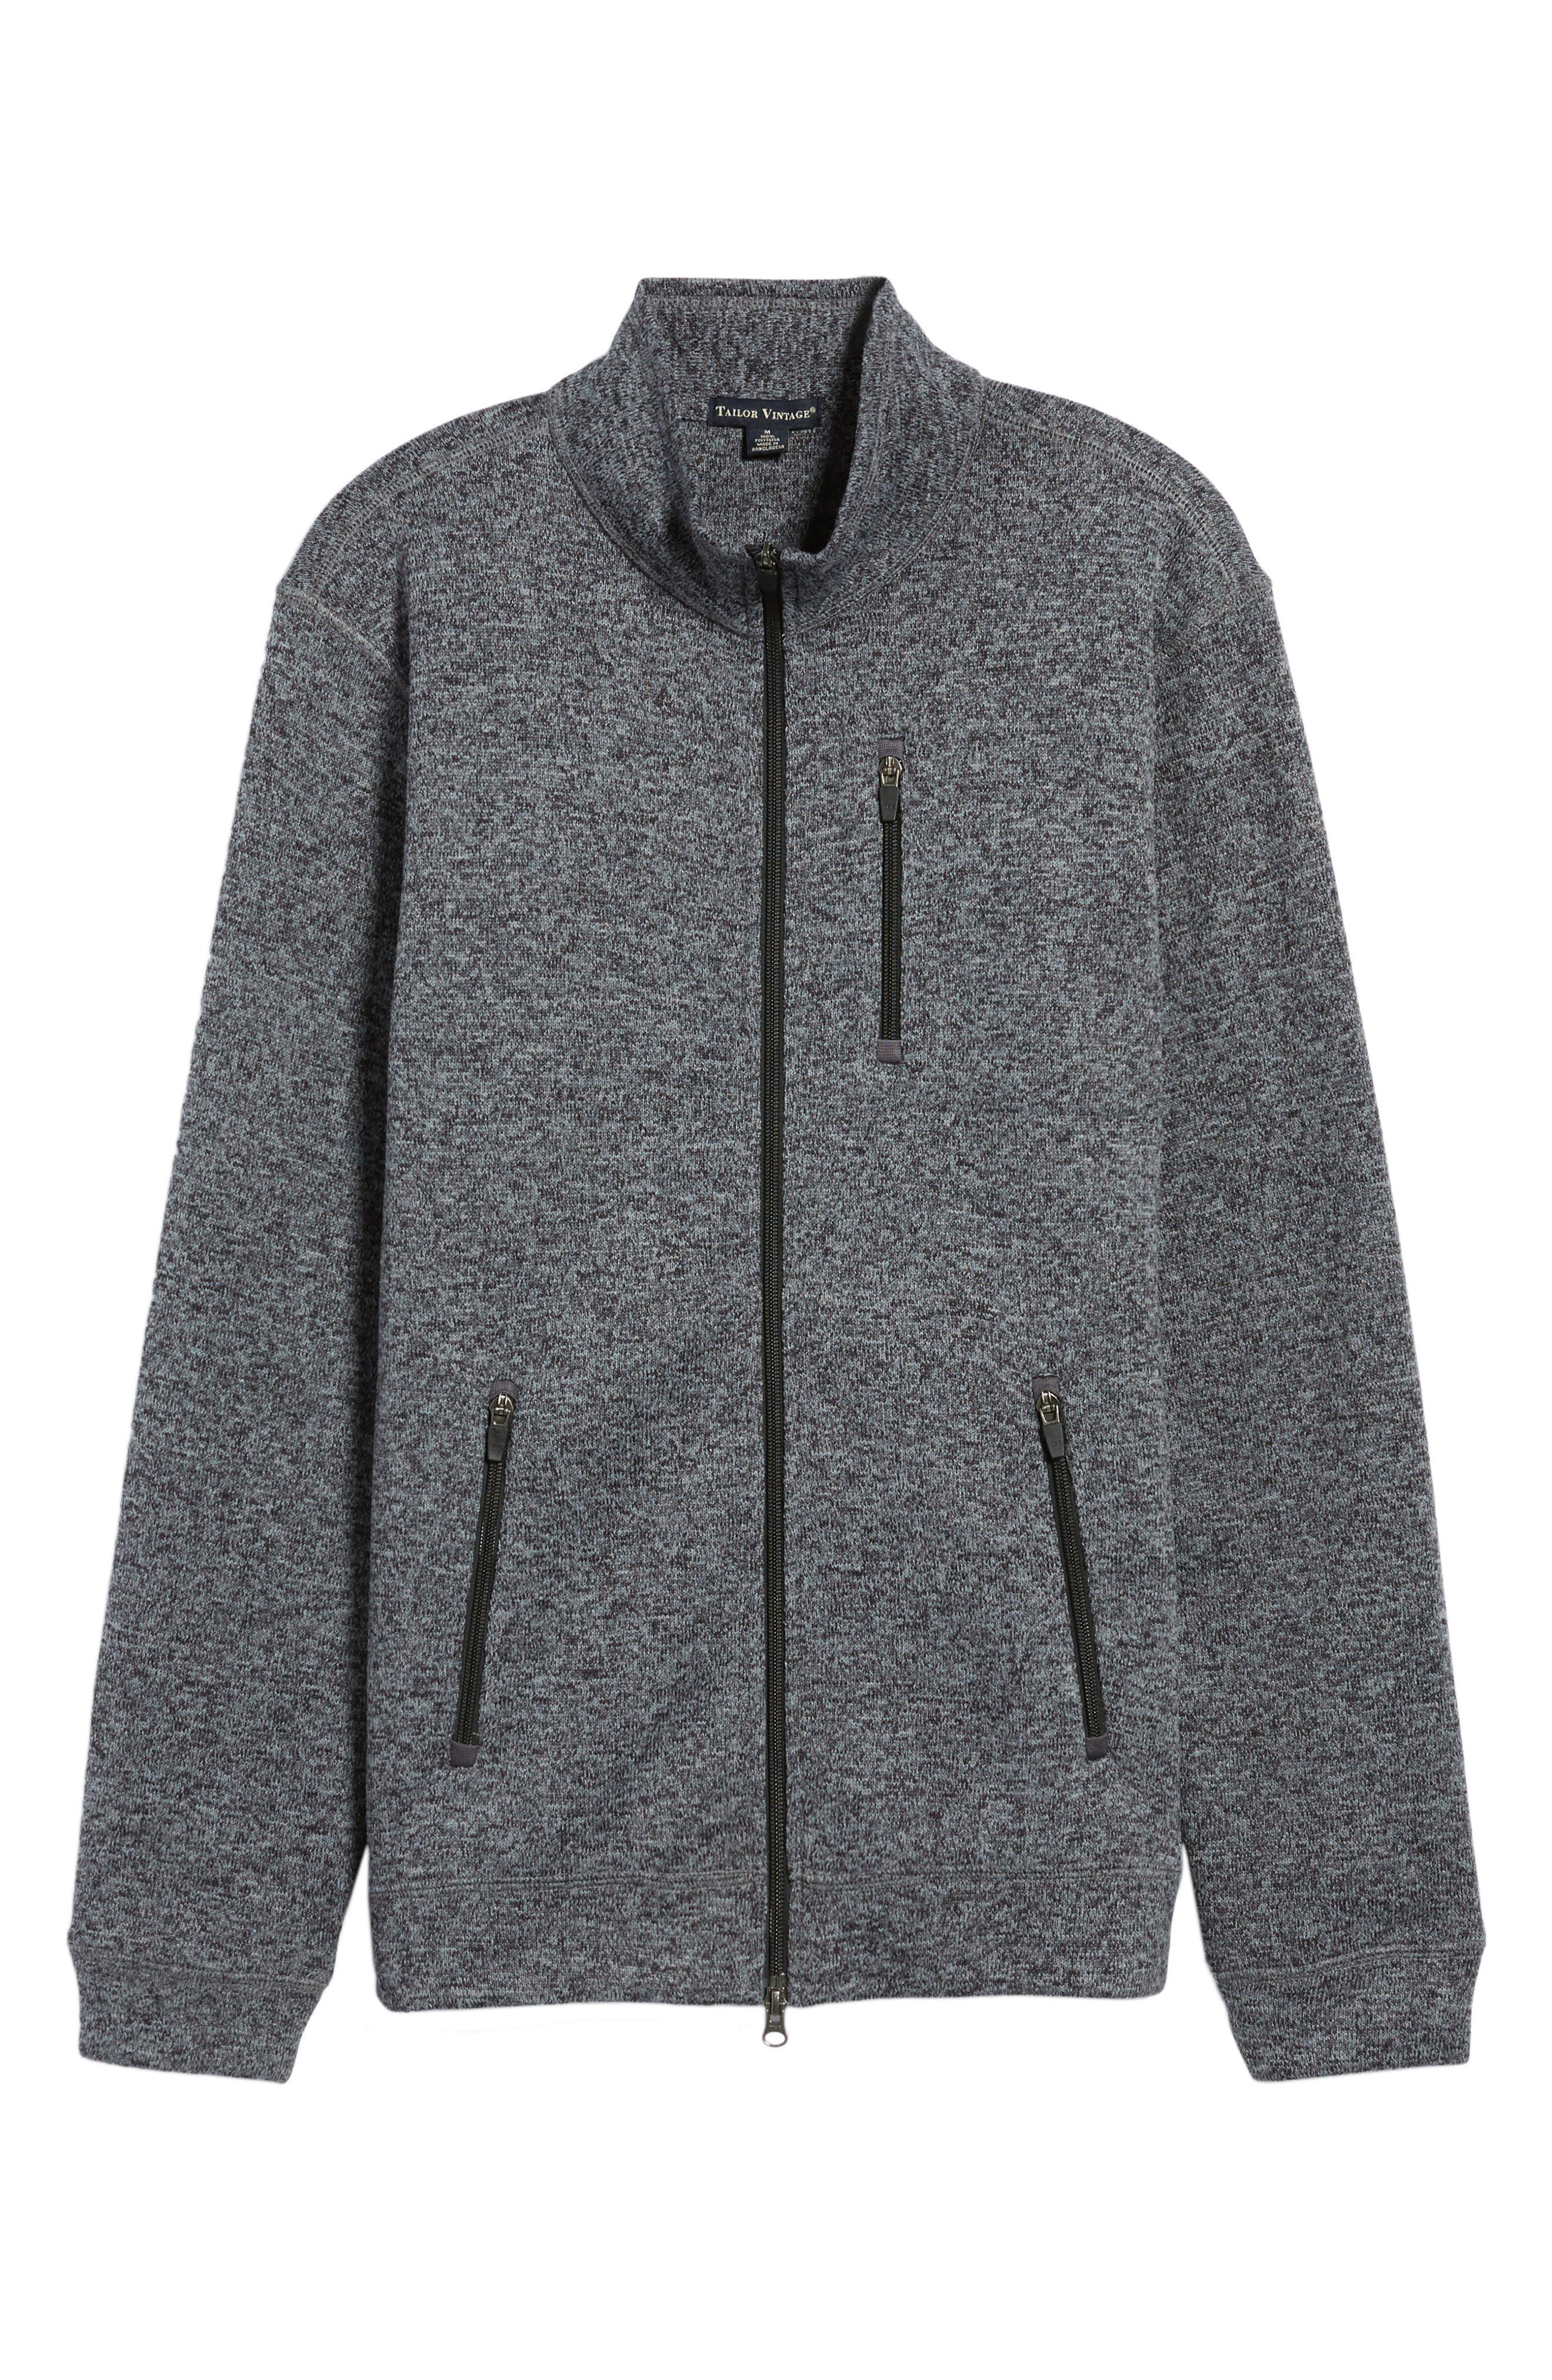 Sweater Knit Fleece Zip Front Jacket,                             Alternate thumbnail 6, color,                             Black/ Grey